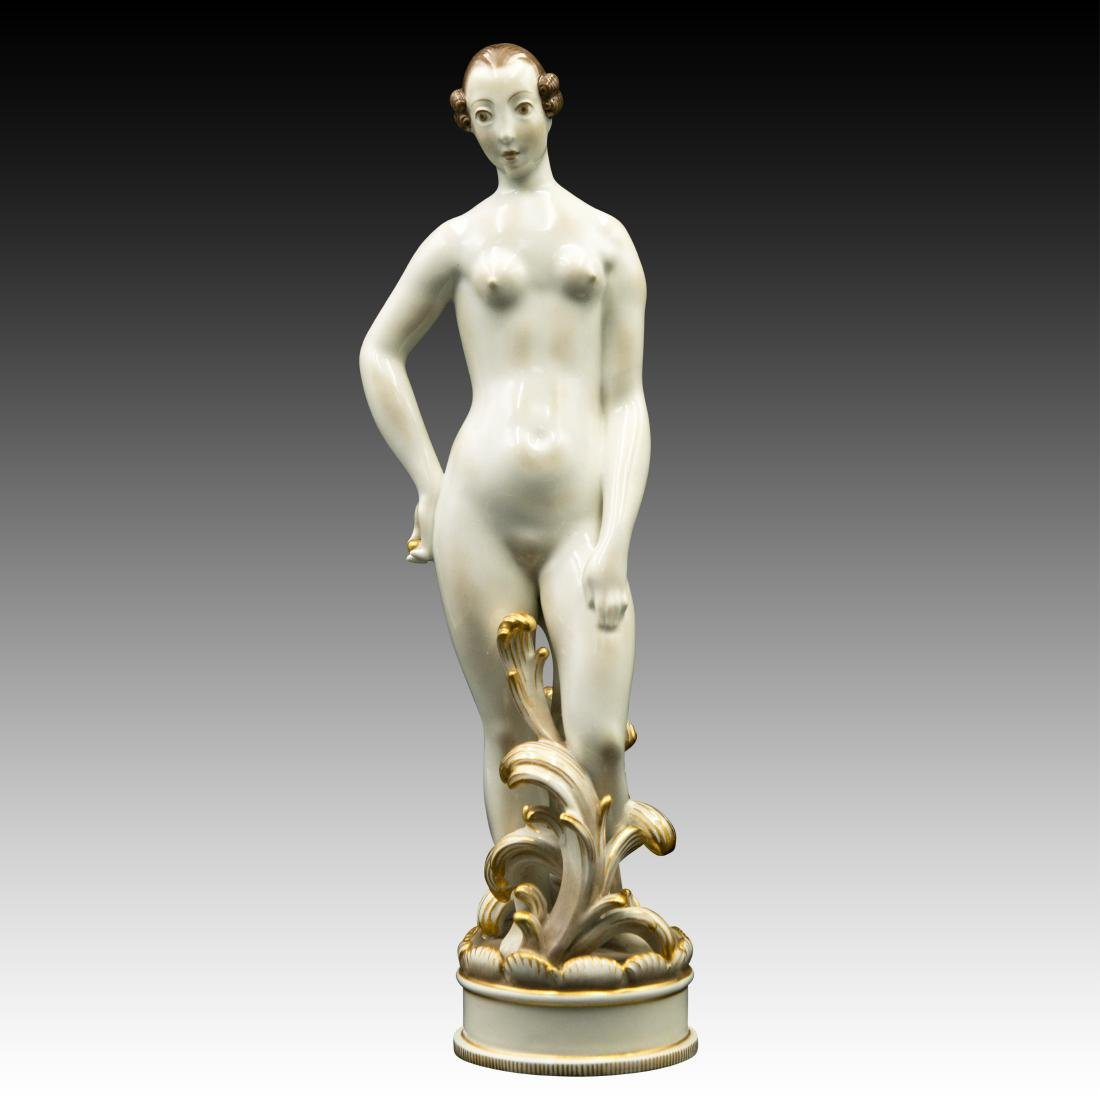 Royal Copenhagen Nude Female Brown Hair Figurine